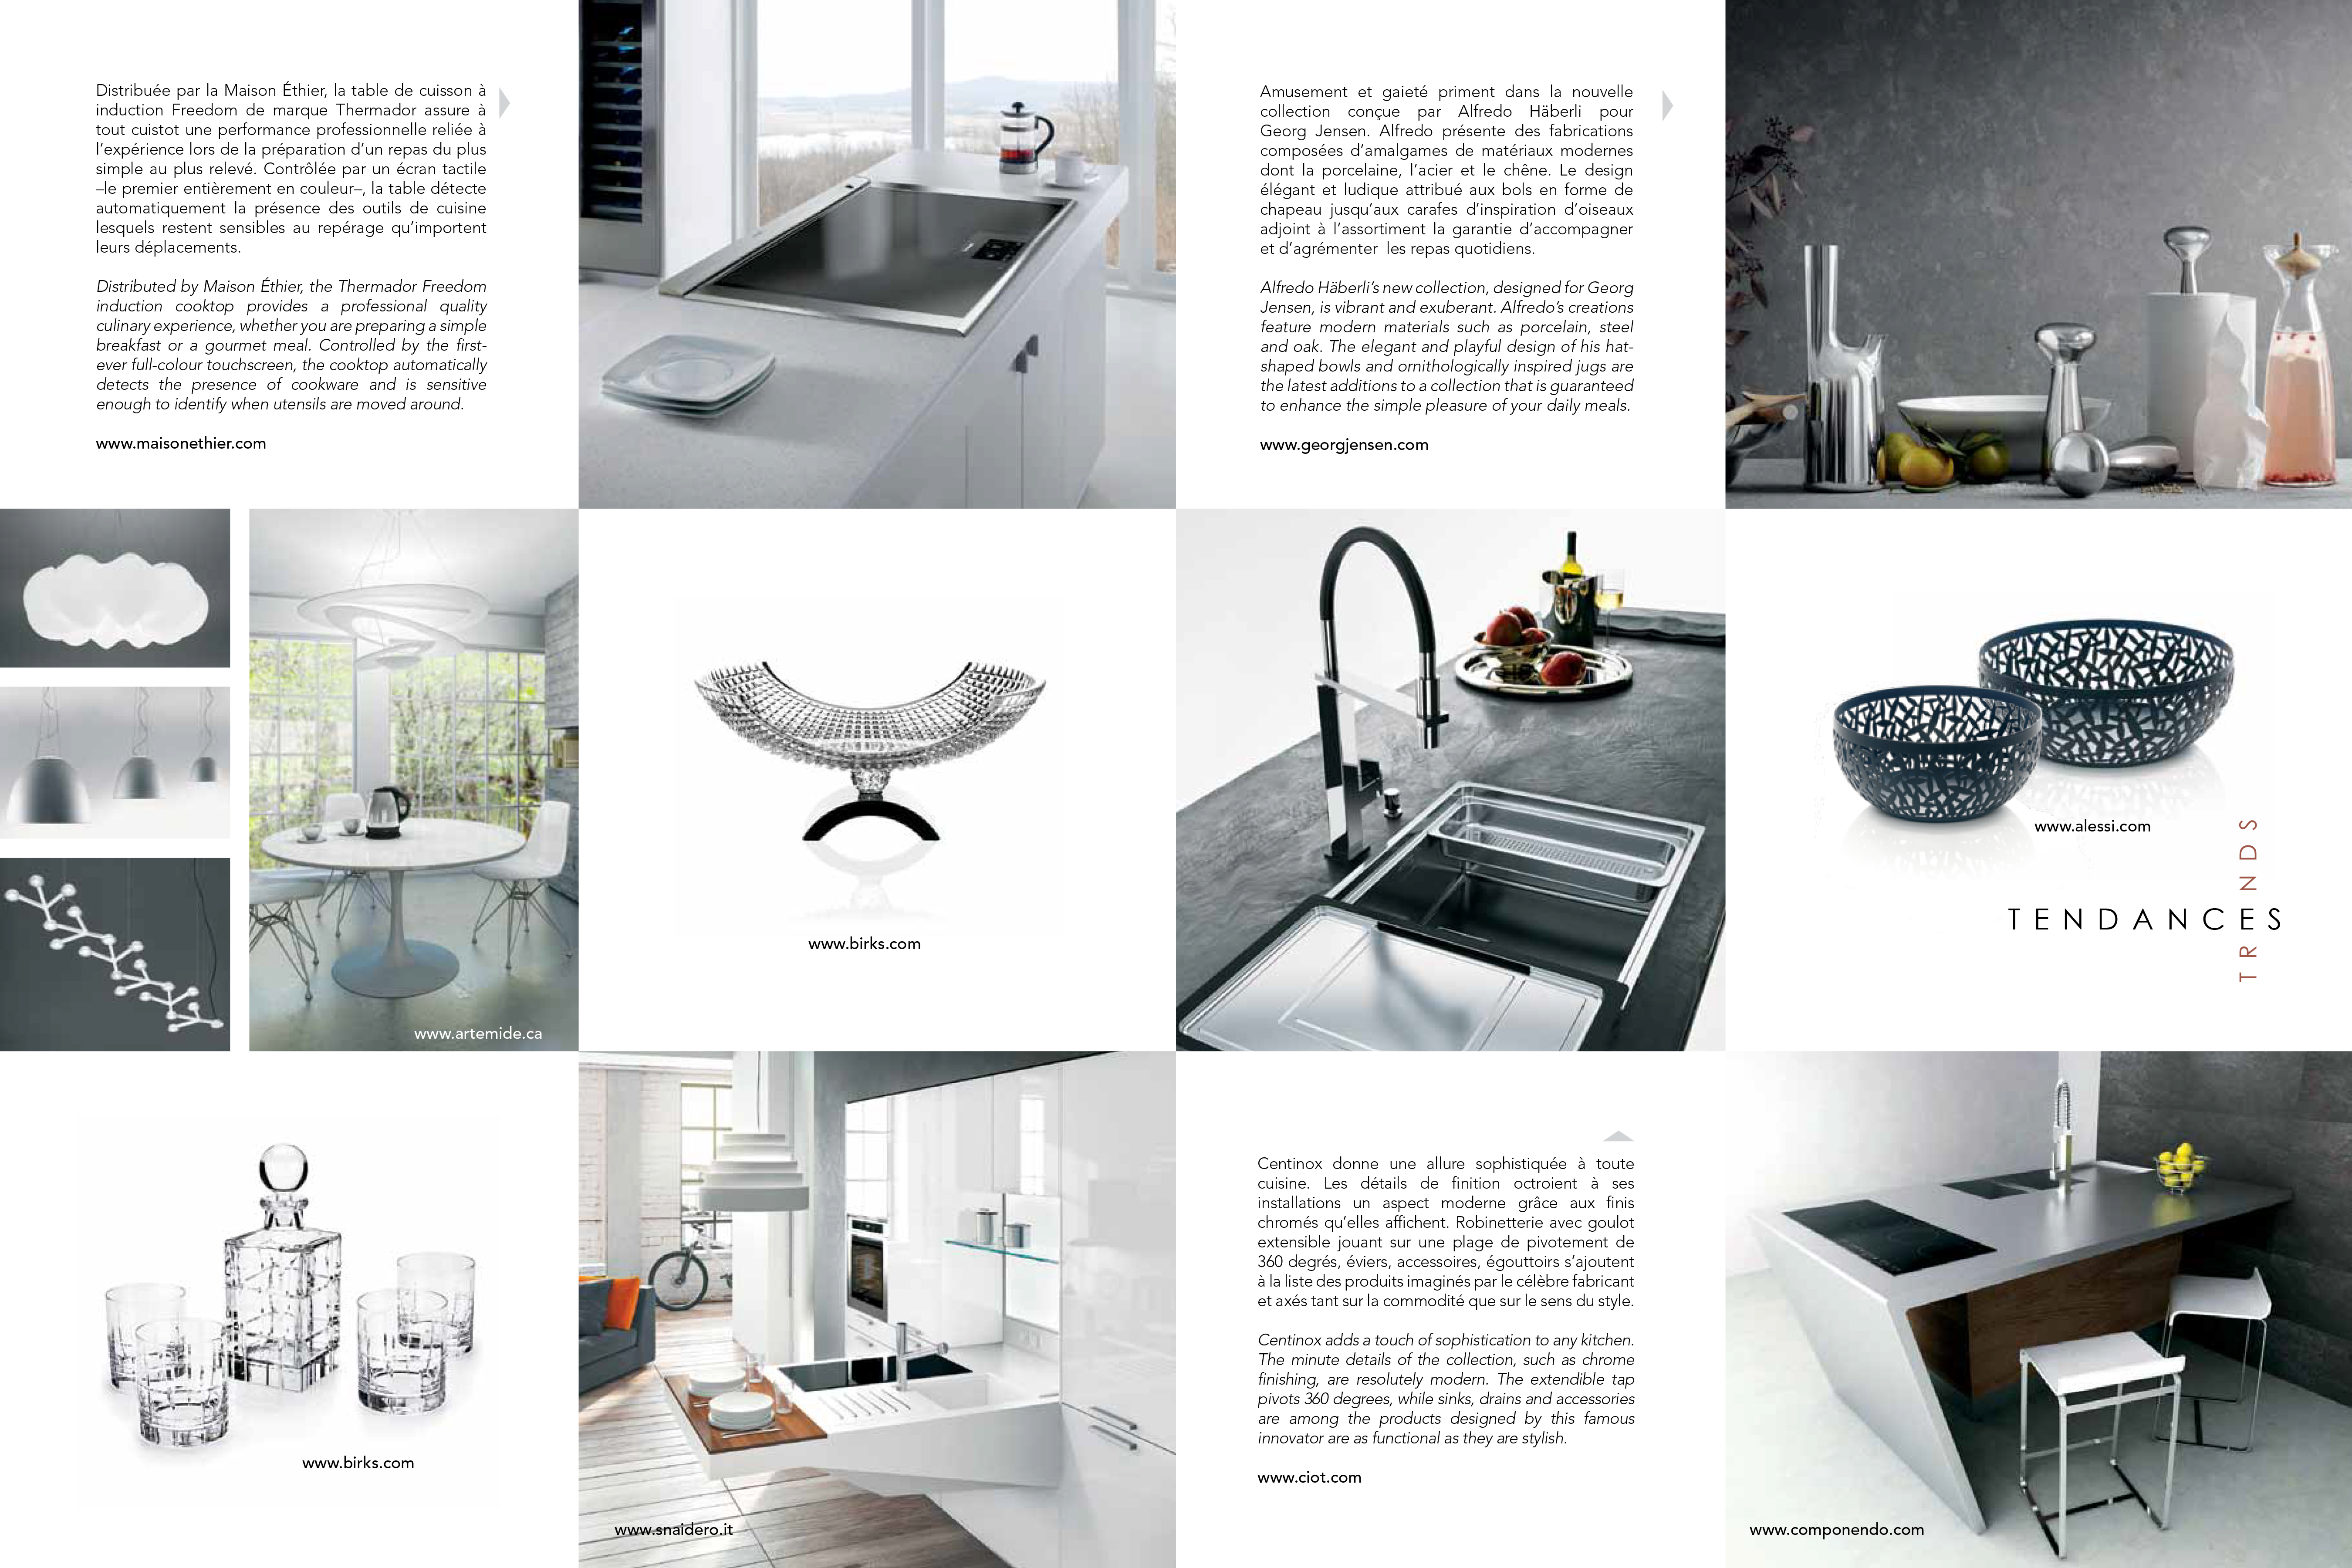 2012 Prestige design magazine   Tendances Cuisines   KITCHEN TRENDS ...